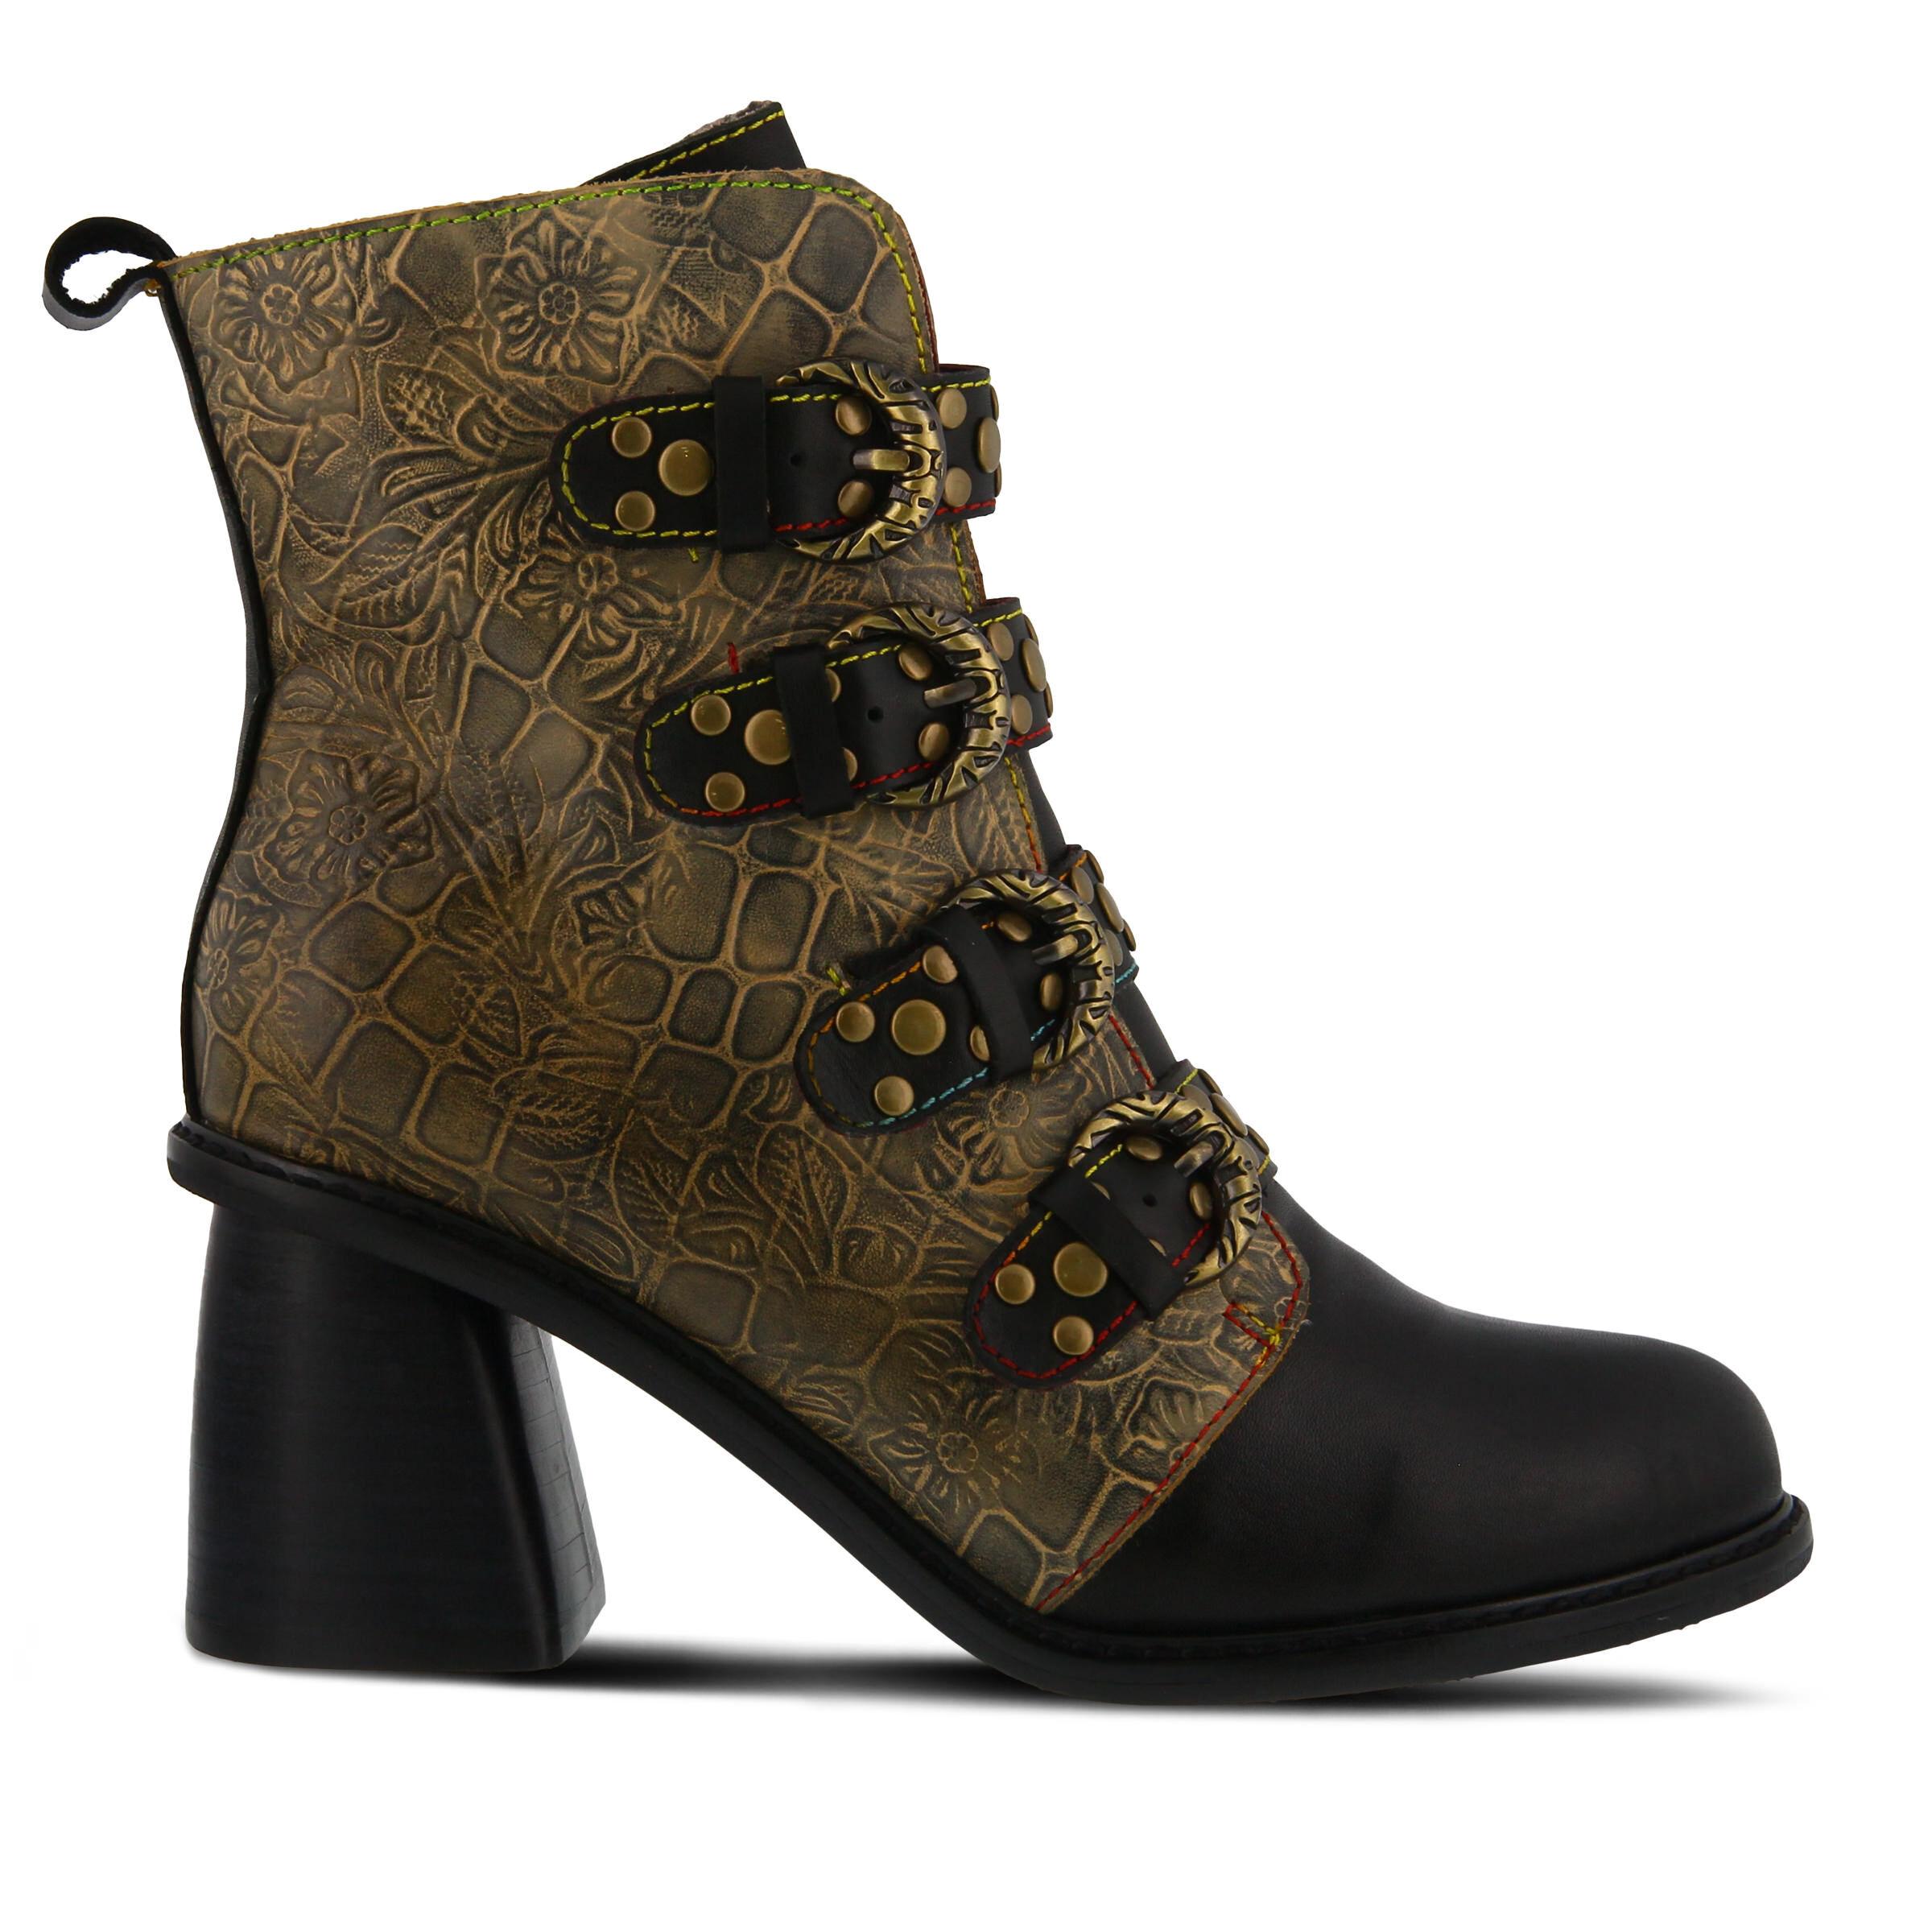 Exclusive Styles Women's L'ARTISTE Wonderland Booties Black Multi